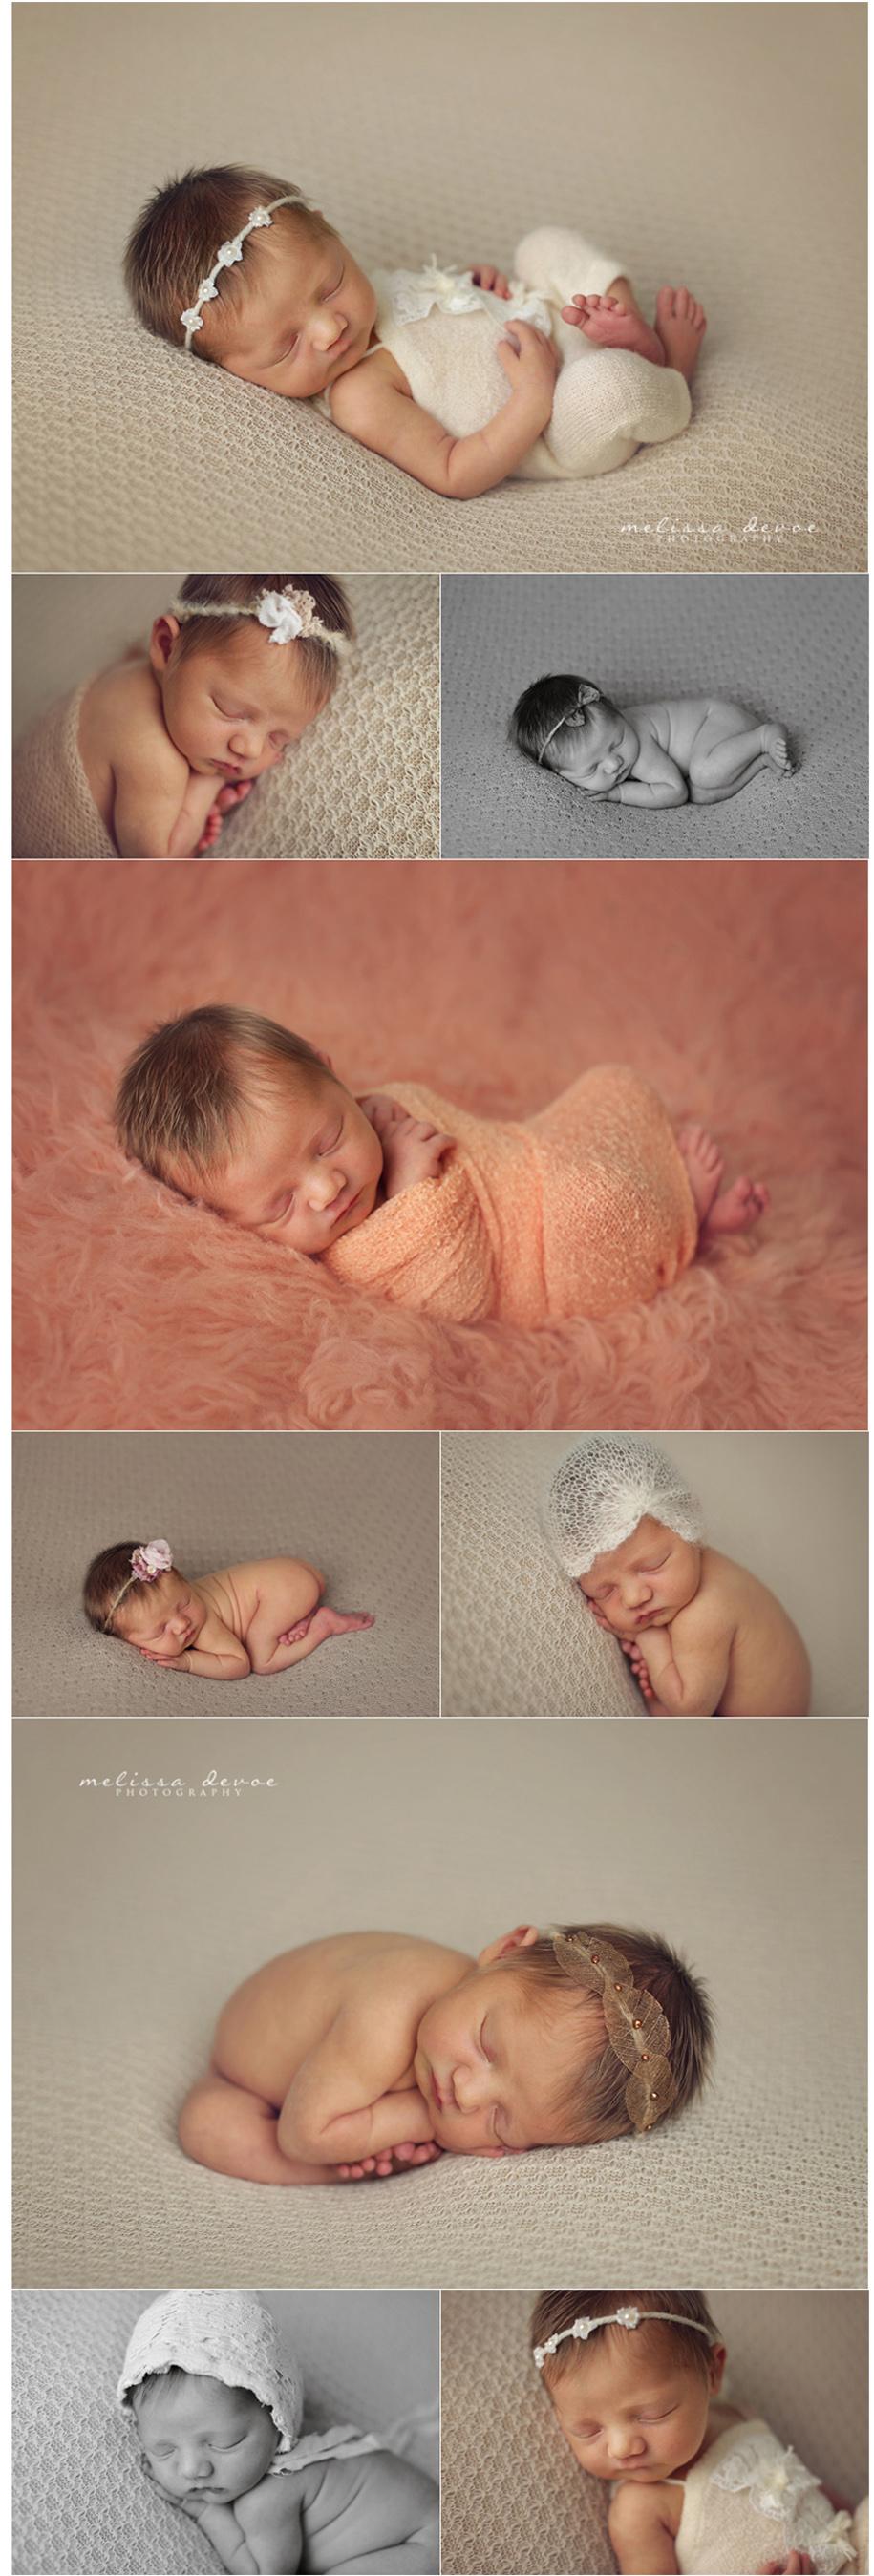 Melissa DeVoe Photography Raleigh Newborn Baby Photographer 3